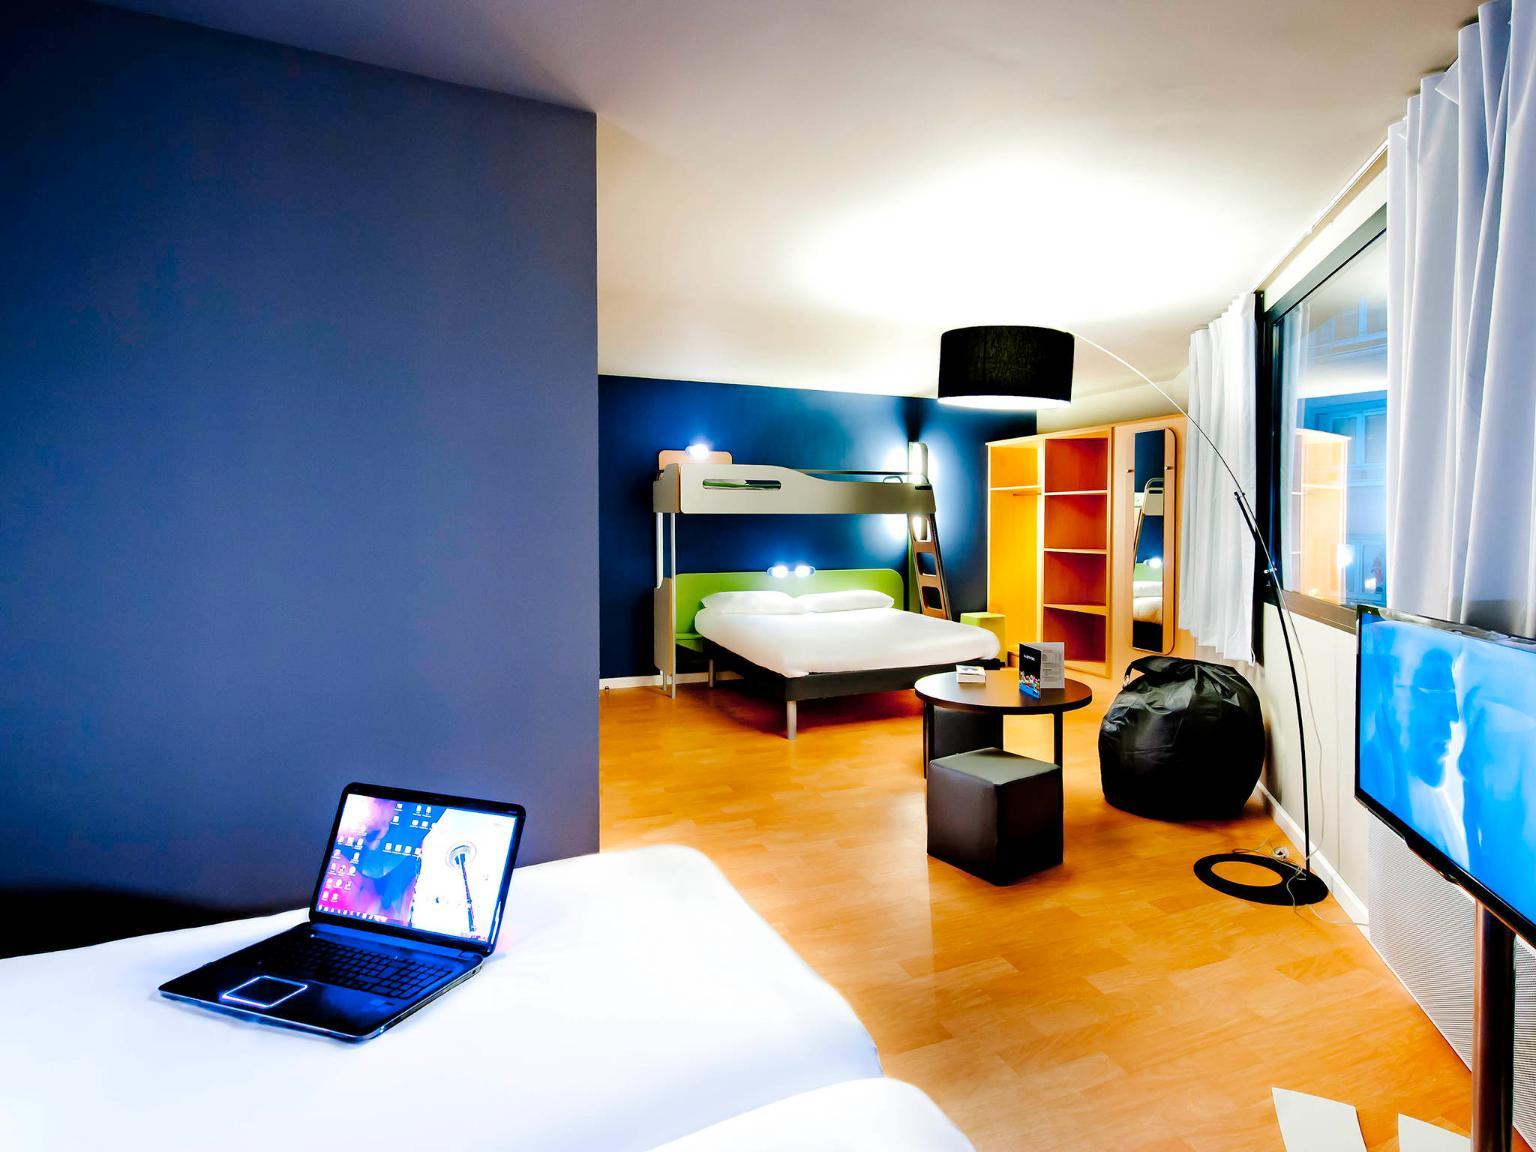 ibis budget brest centre port h tel 31 rue jean marie. Black Bedroom Furniture Sets. Home Design Ideas